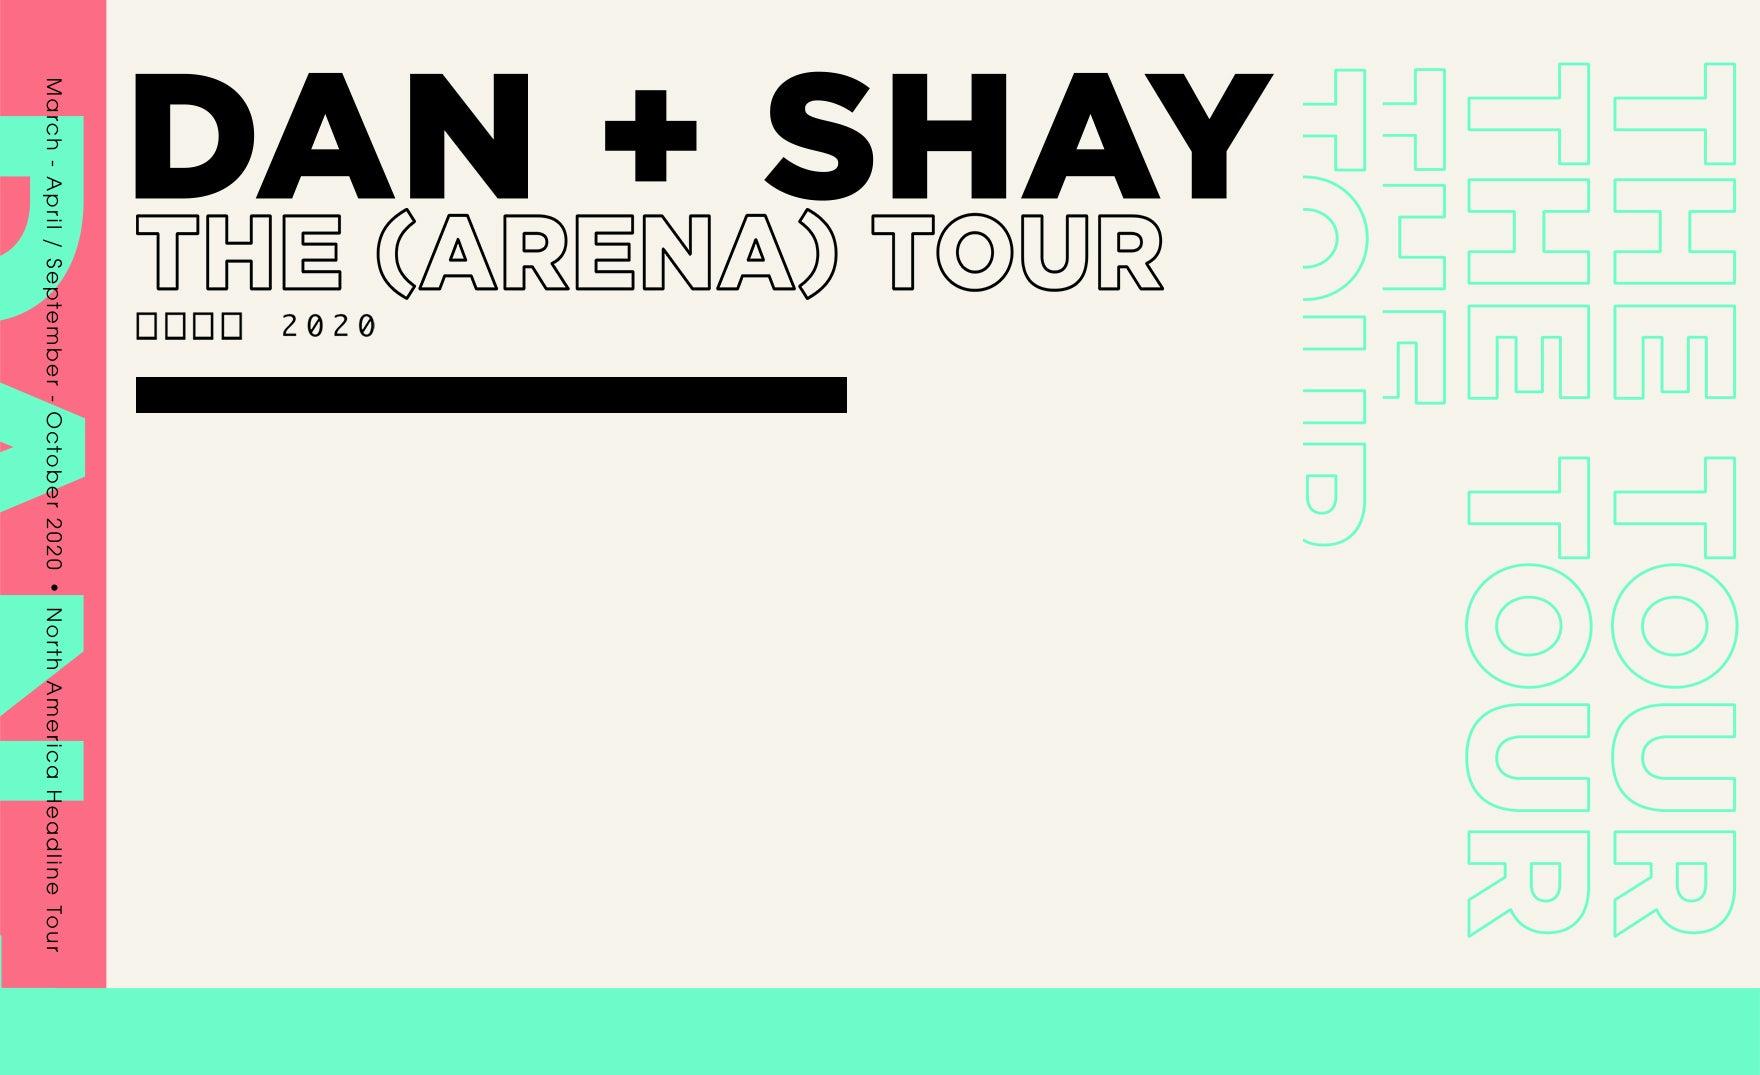 Dan + Shay - Rescheduled for 9-17-21